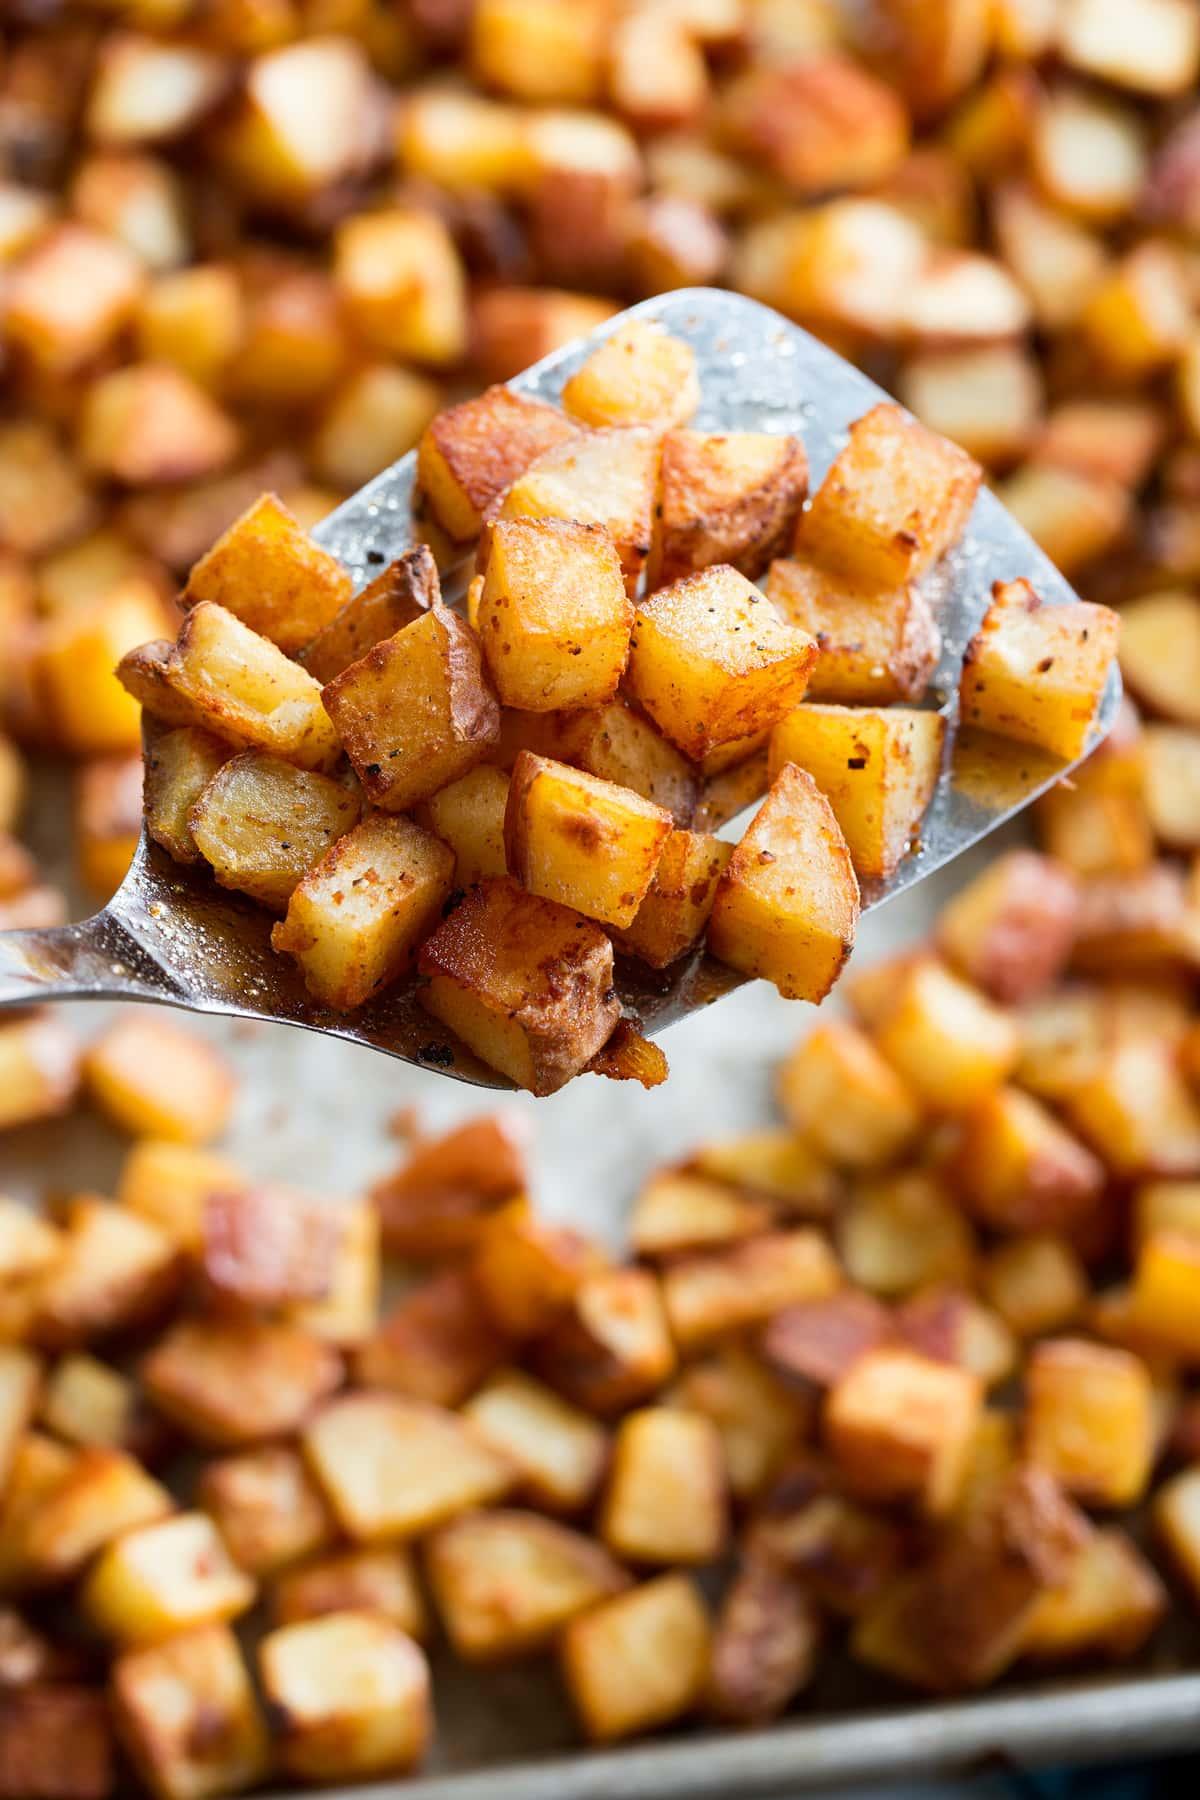 Photo: Close up of breakfast potatoes on a metal spatula.